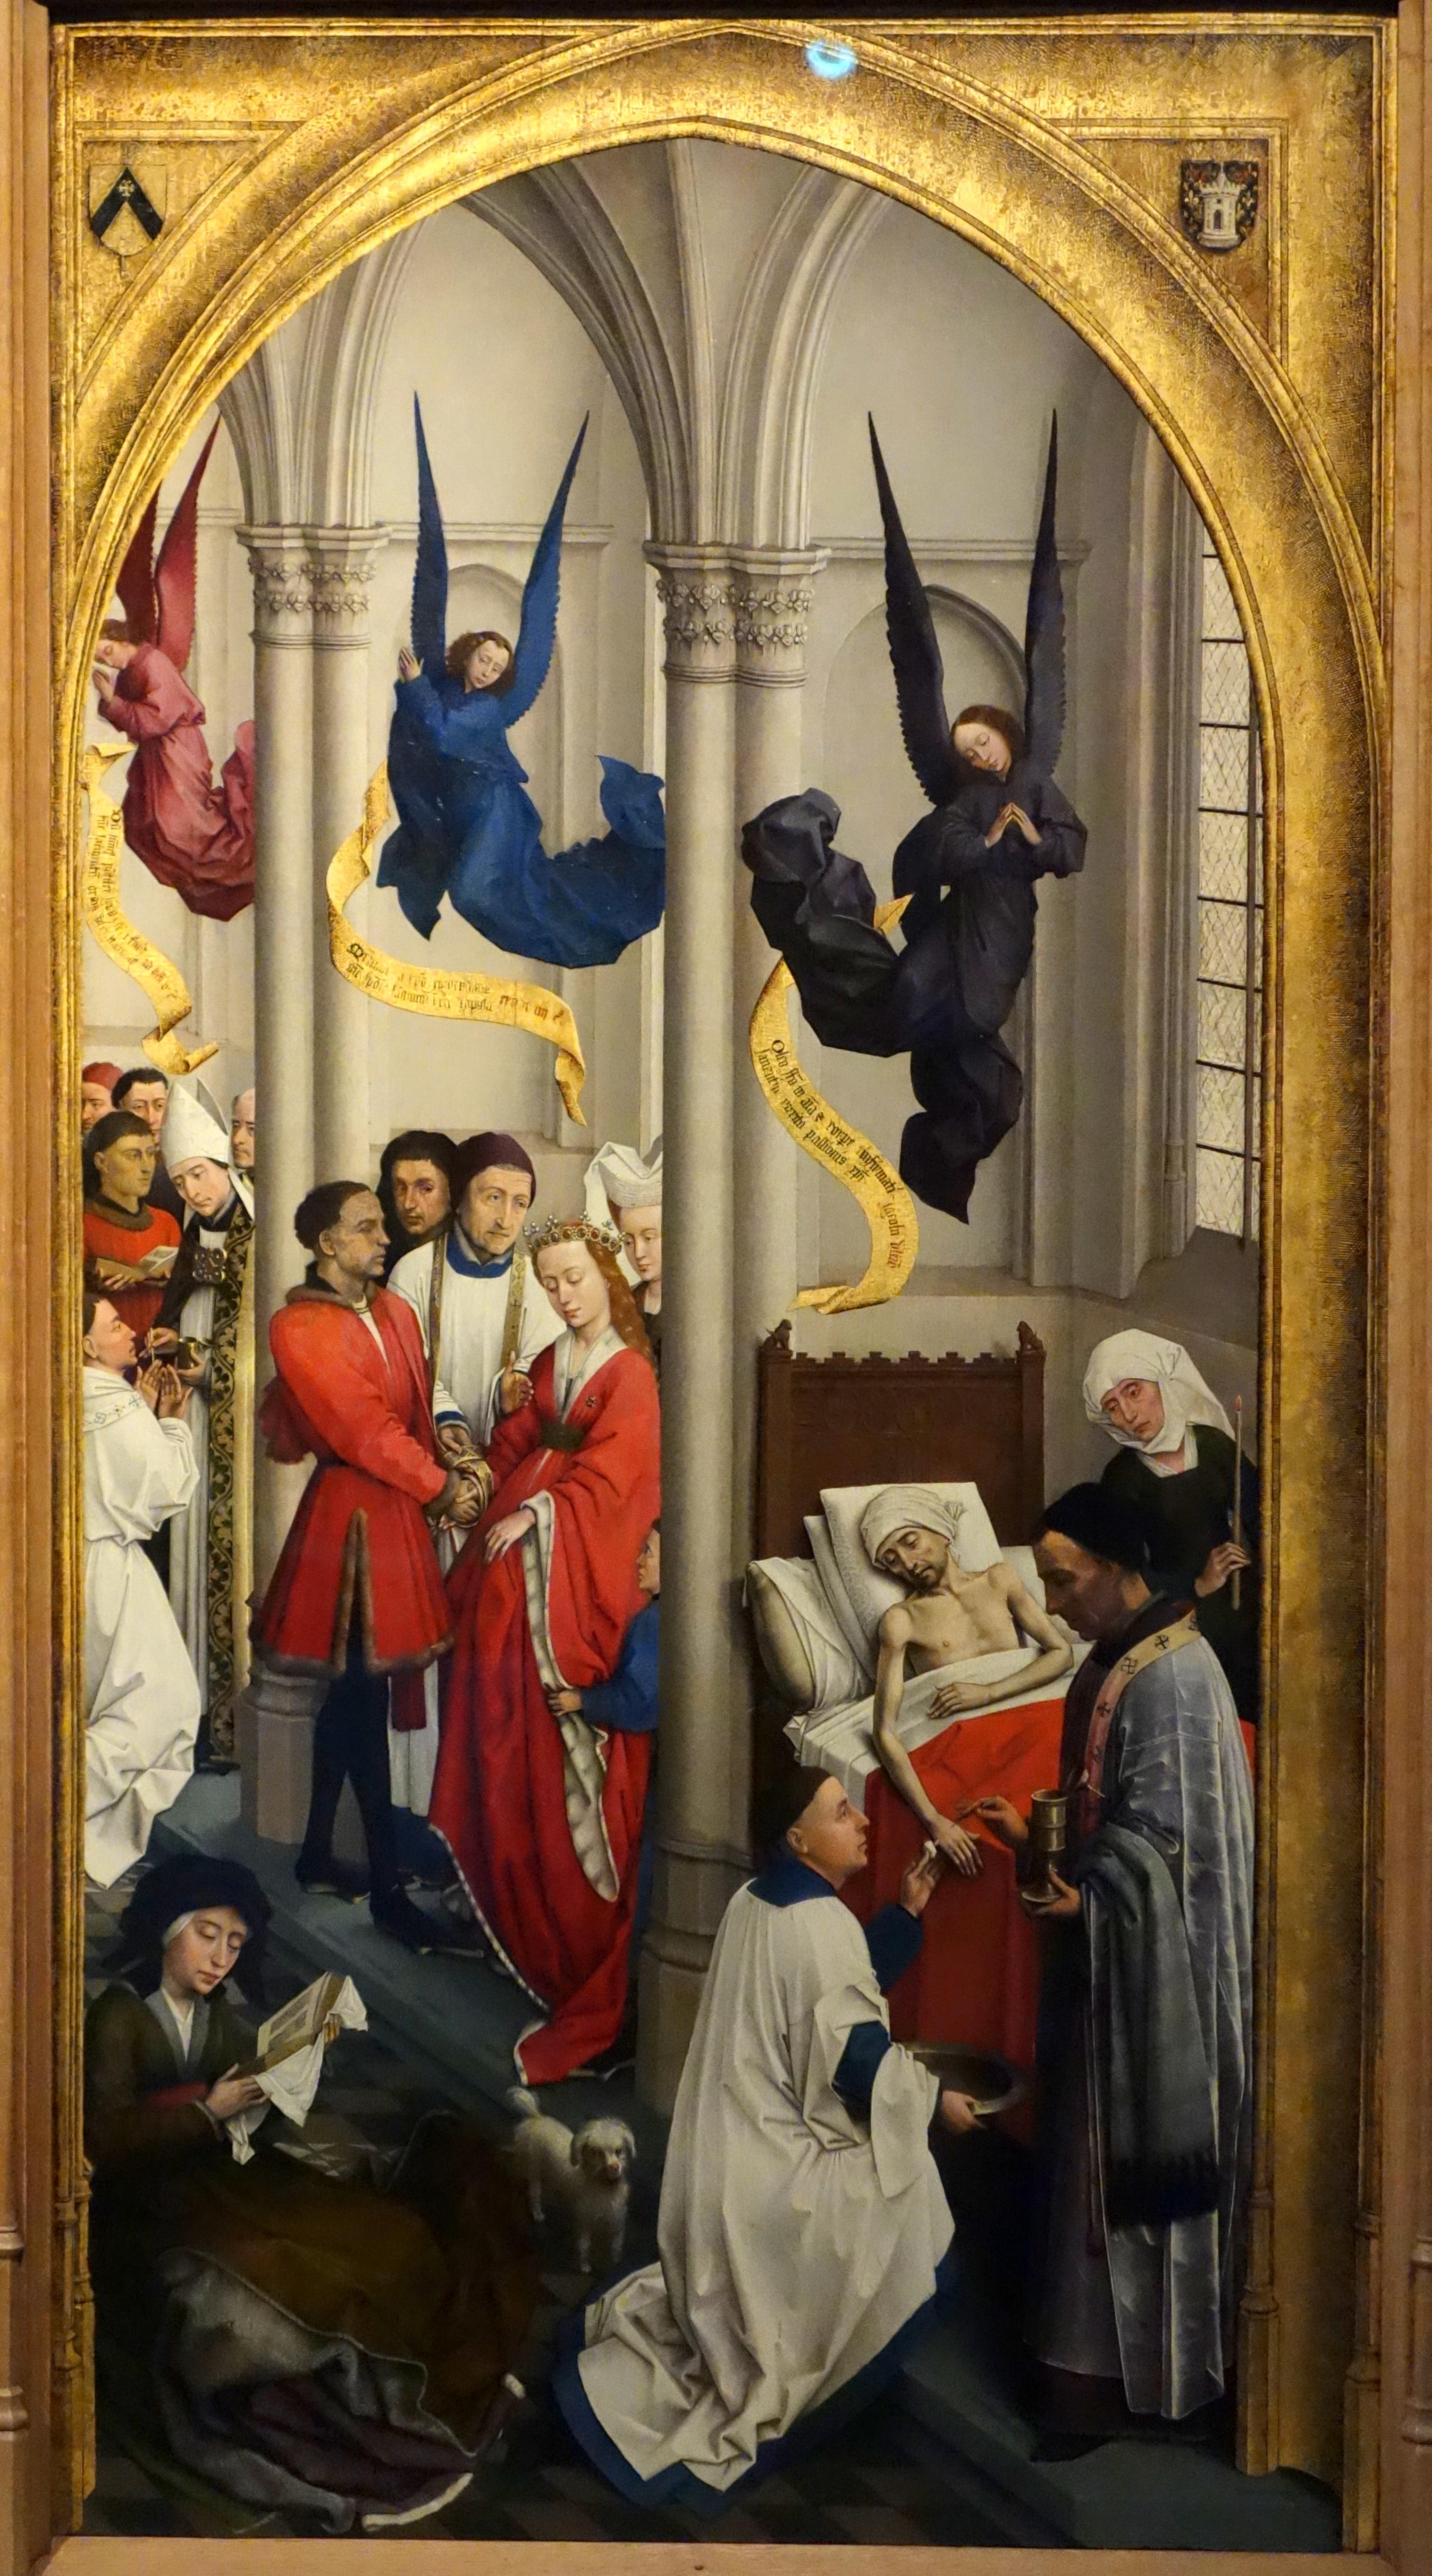 File:The Seven Sacraments by Rogier van der Weyden, c. 1440-1445